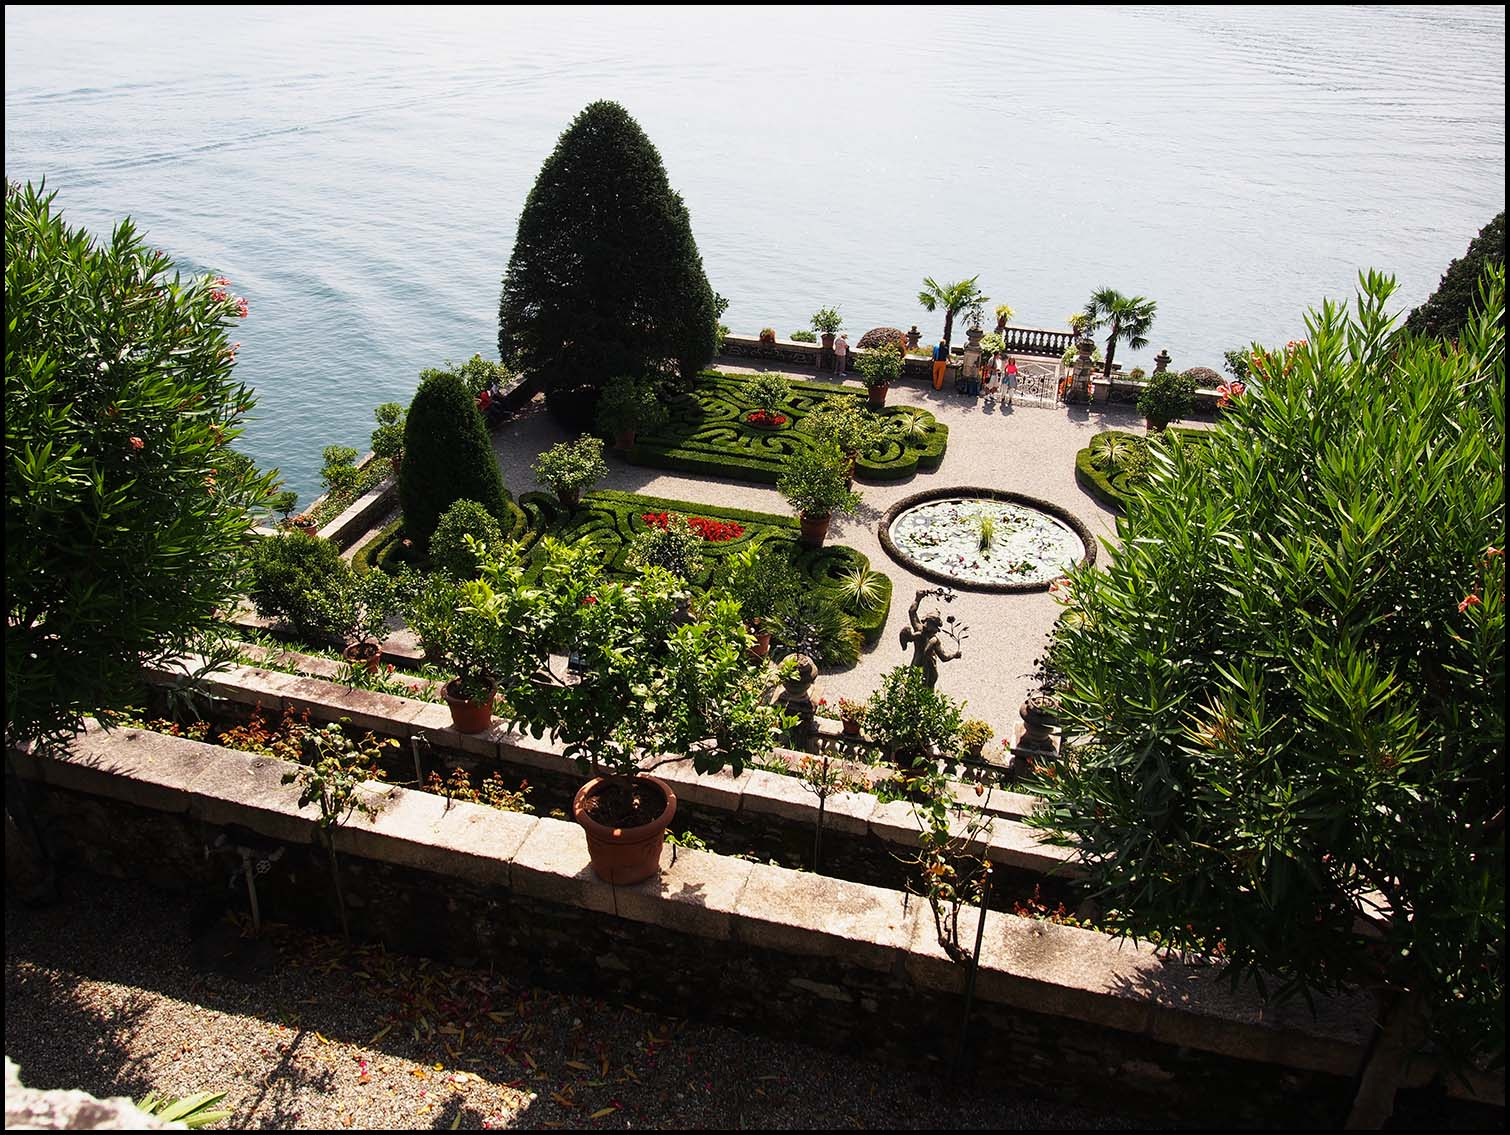 Mazed Gardens, Isola Bella, Italy